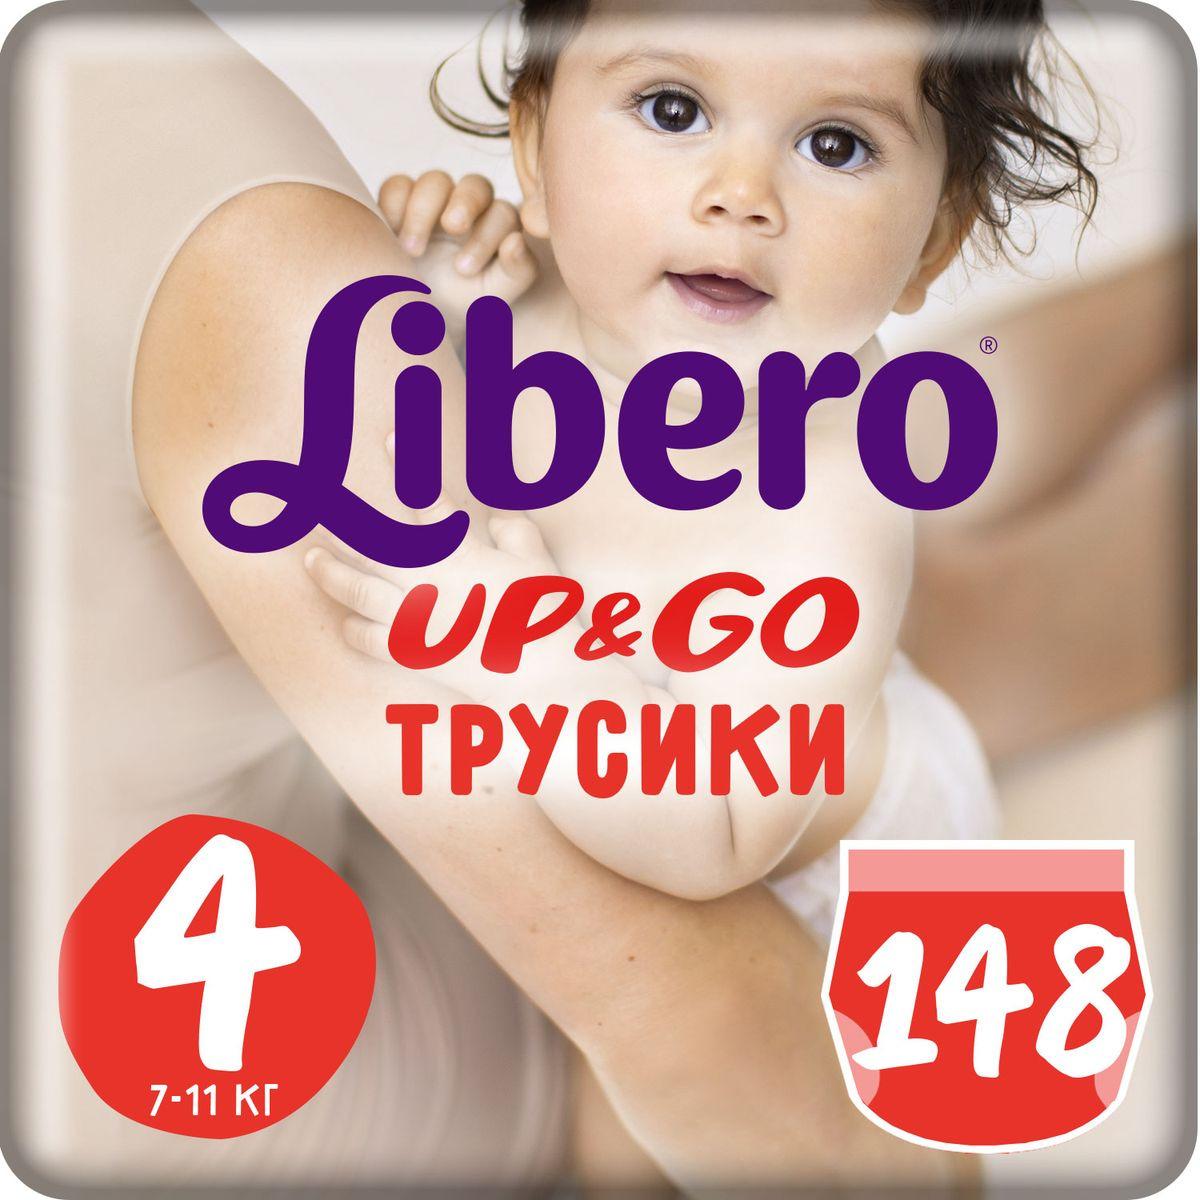 Трусики Libero Up&Go 4, 7-11 кг, 148 шт